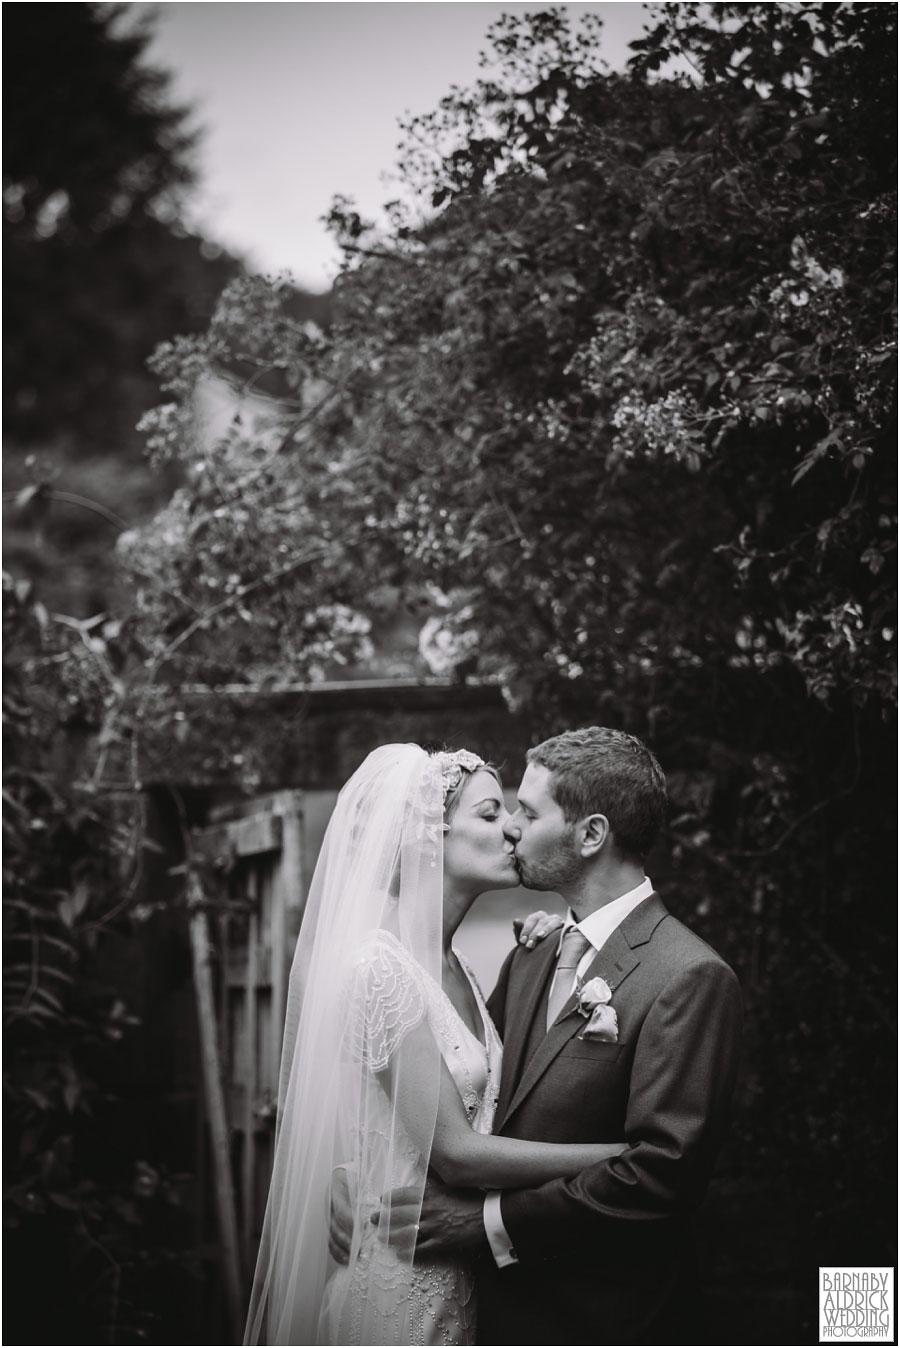 Inn at Whitewell Lancashire Wedding Photographer by Barnaby Aldrick Wedding Photography 048.jpg